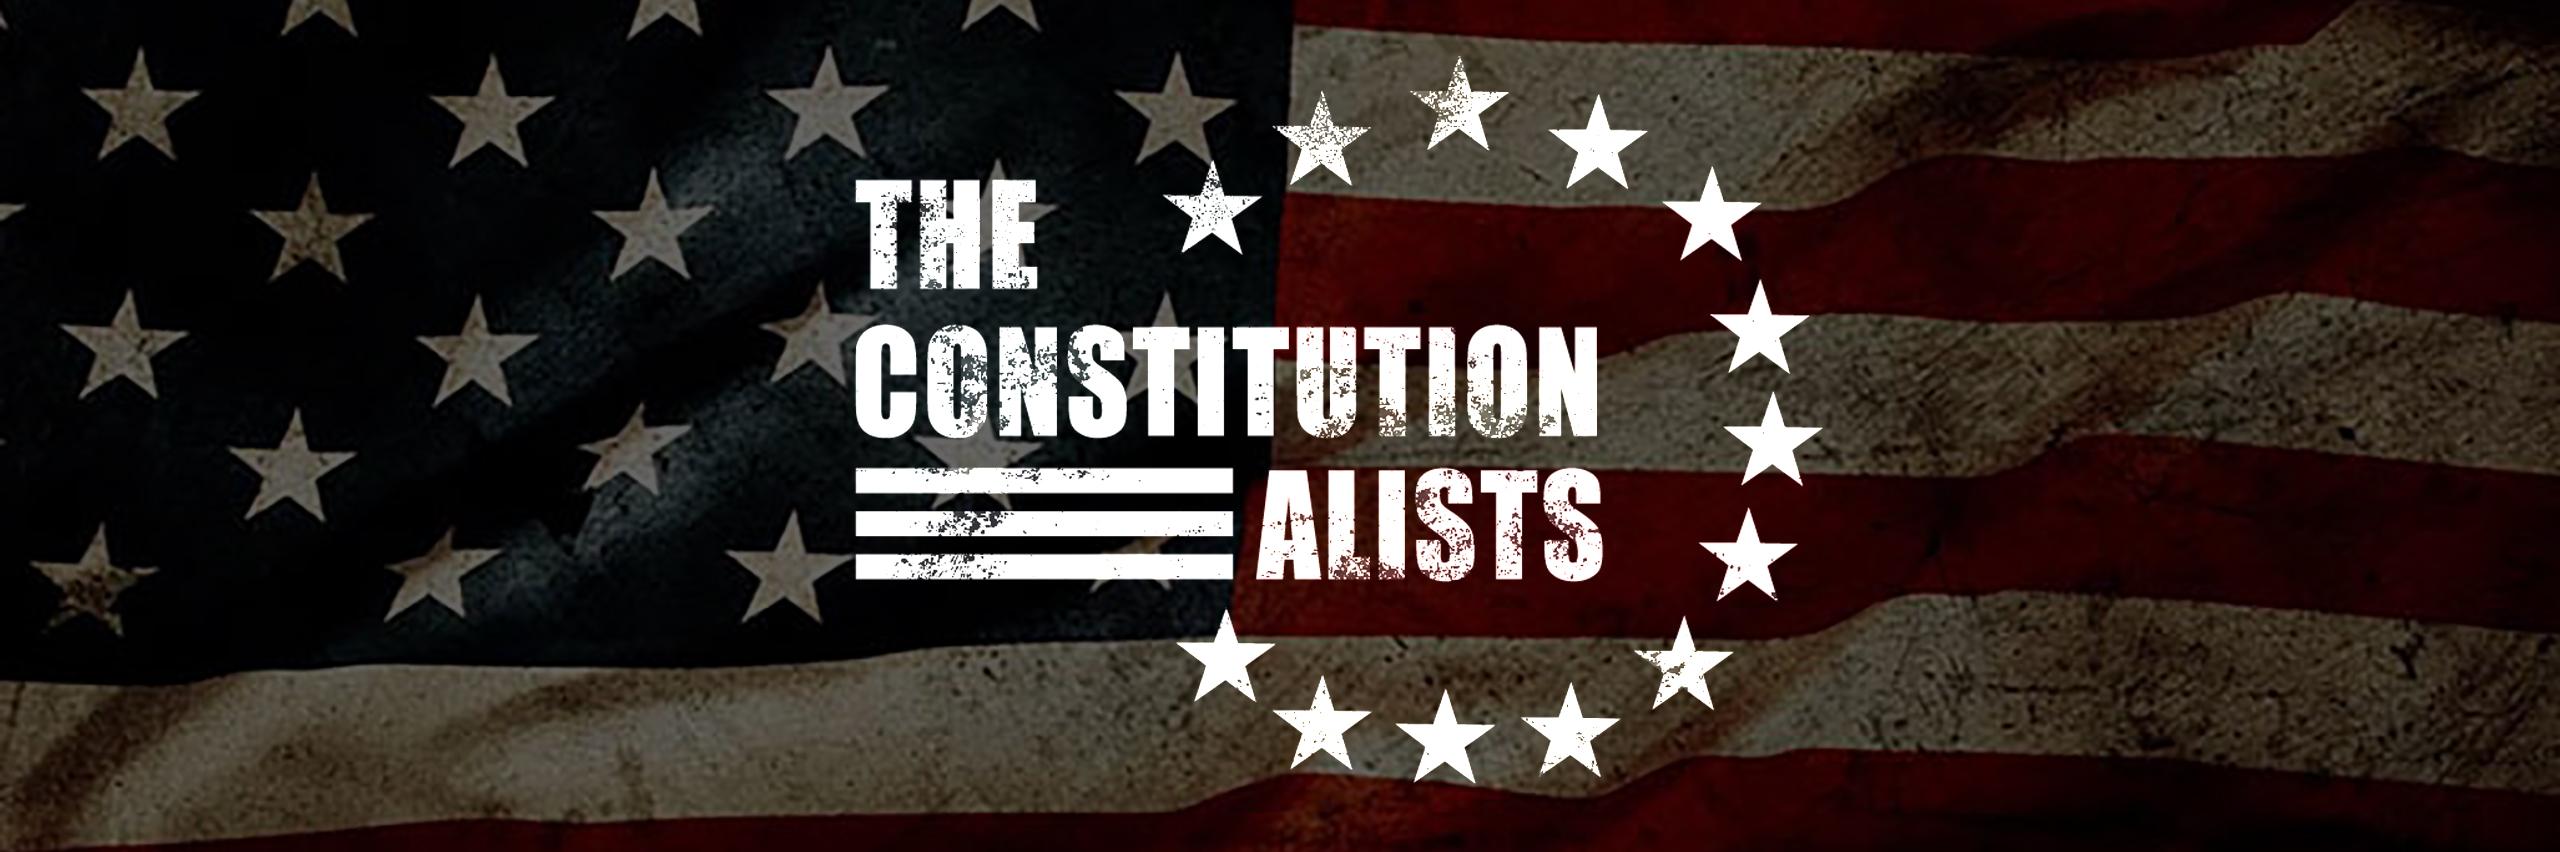 TheConstitutionalists-header2